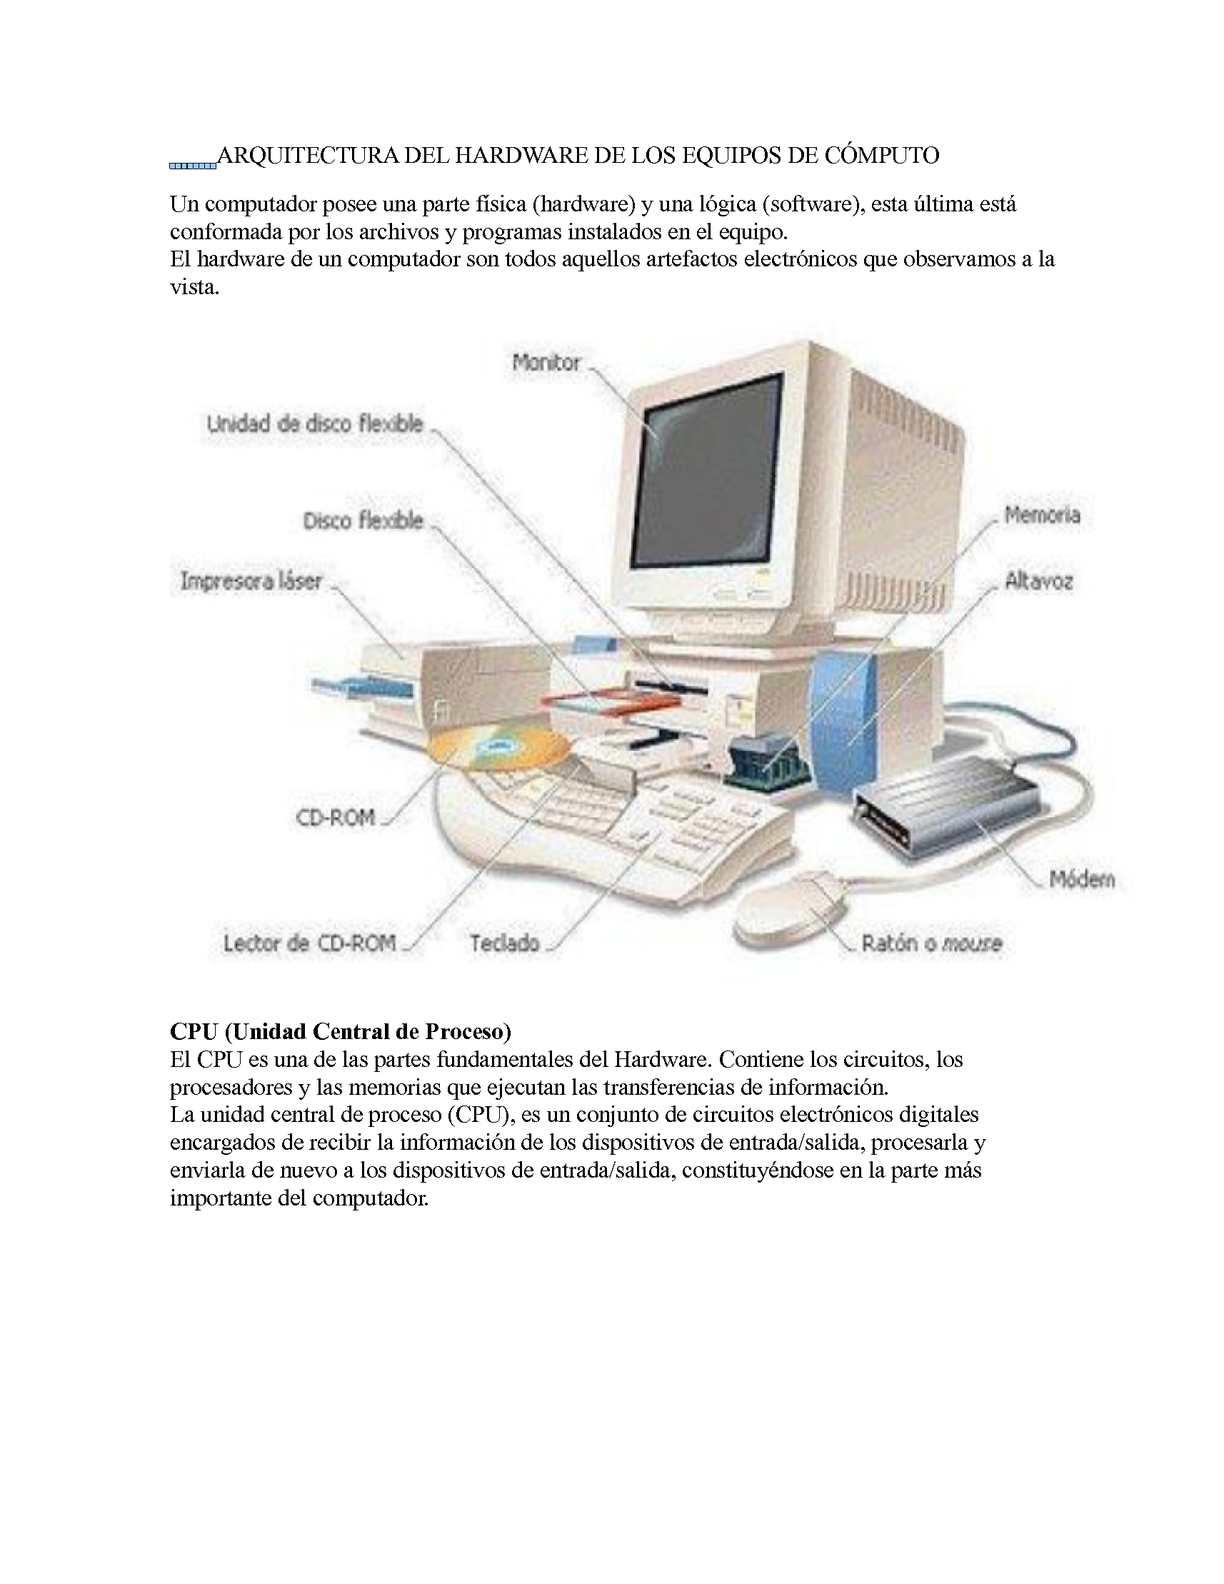 Calam o arquitectura del hardware de los equipos de c mputo for Arquitectura hardware